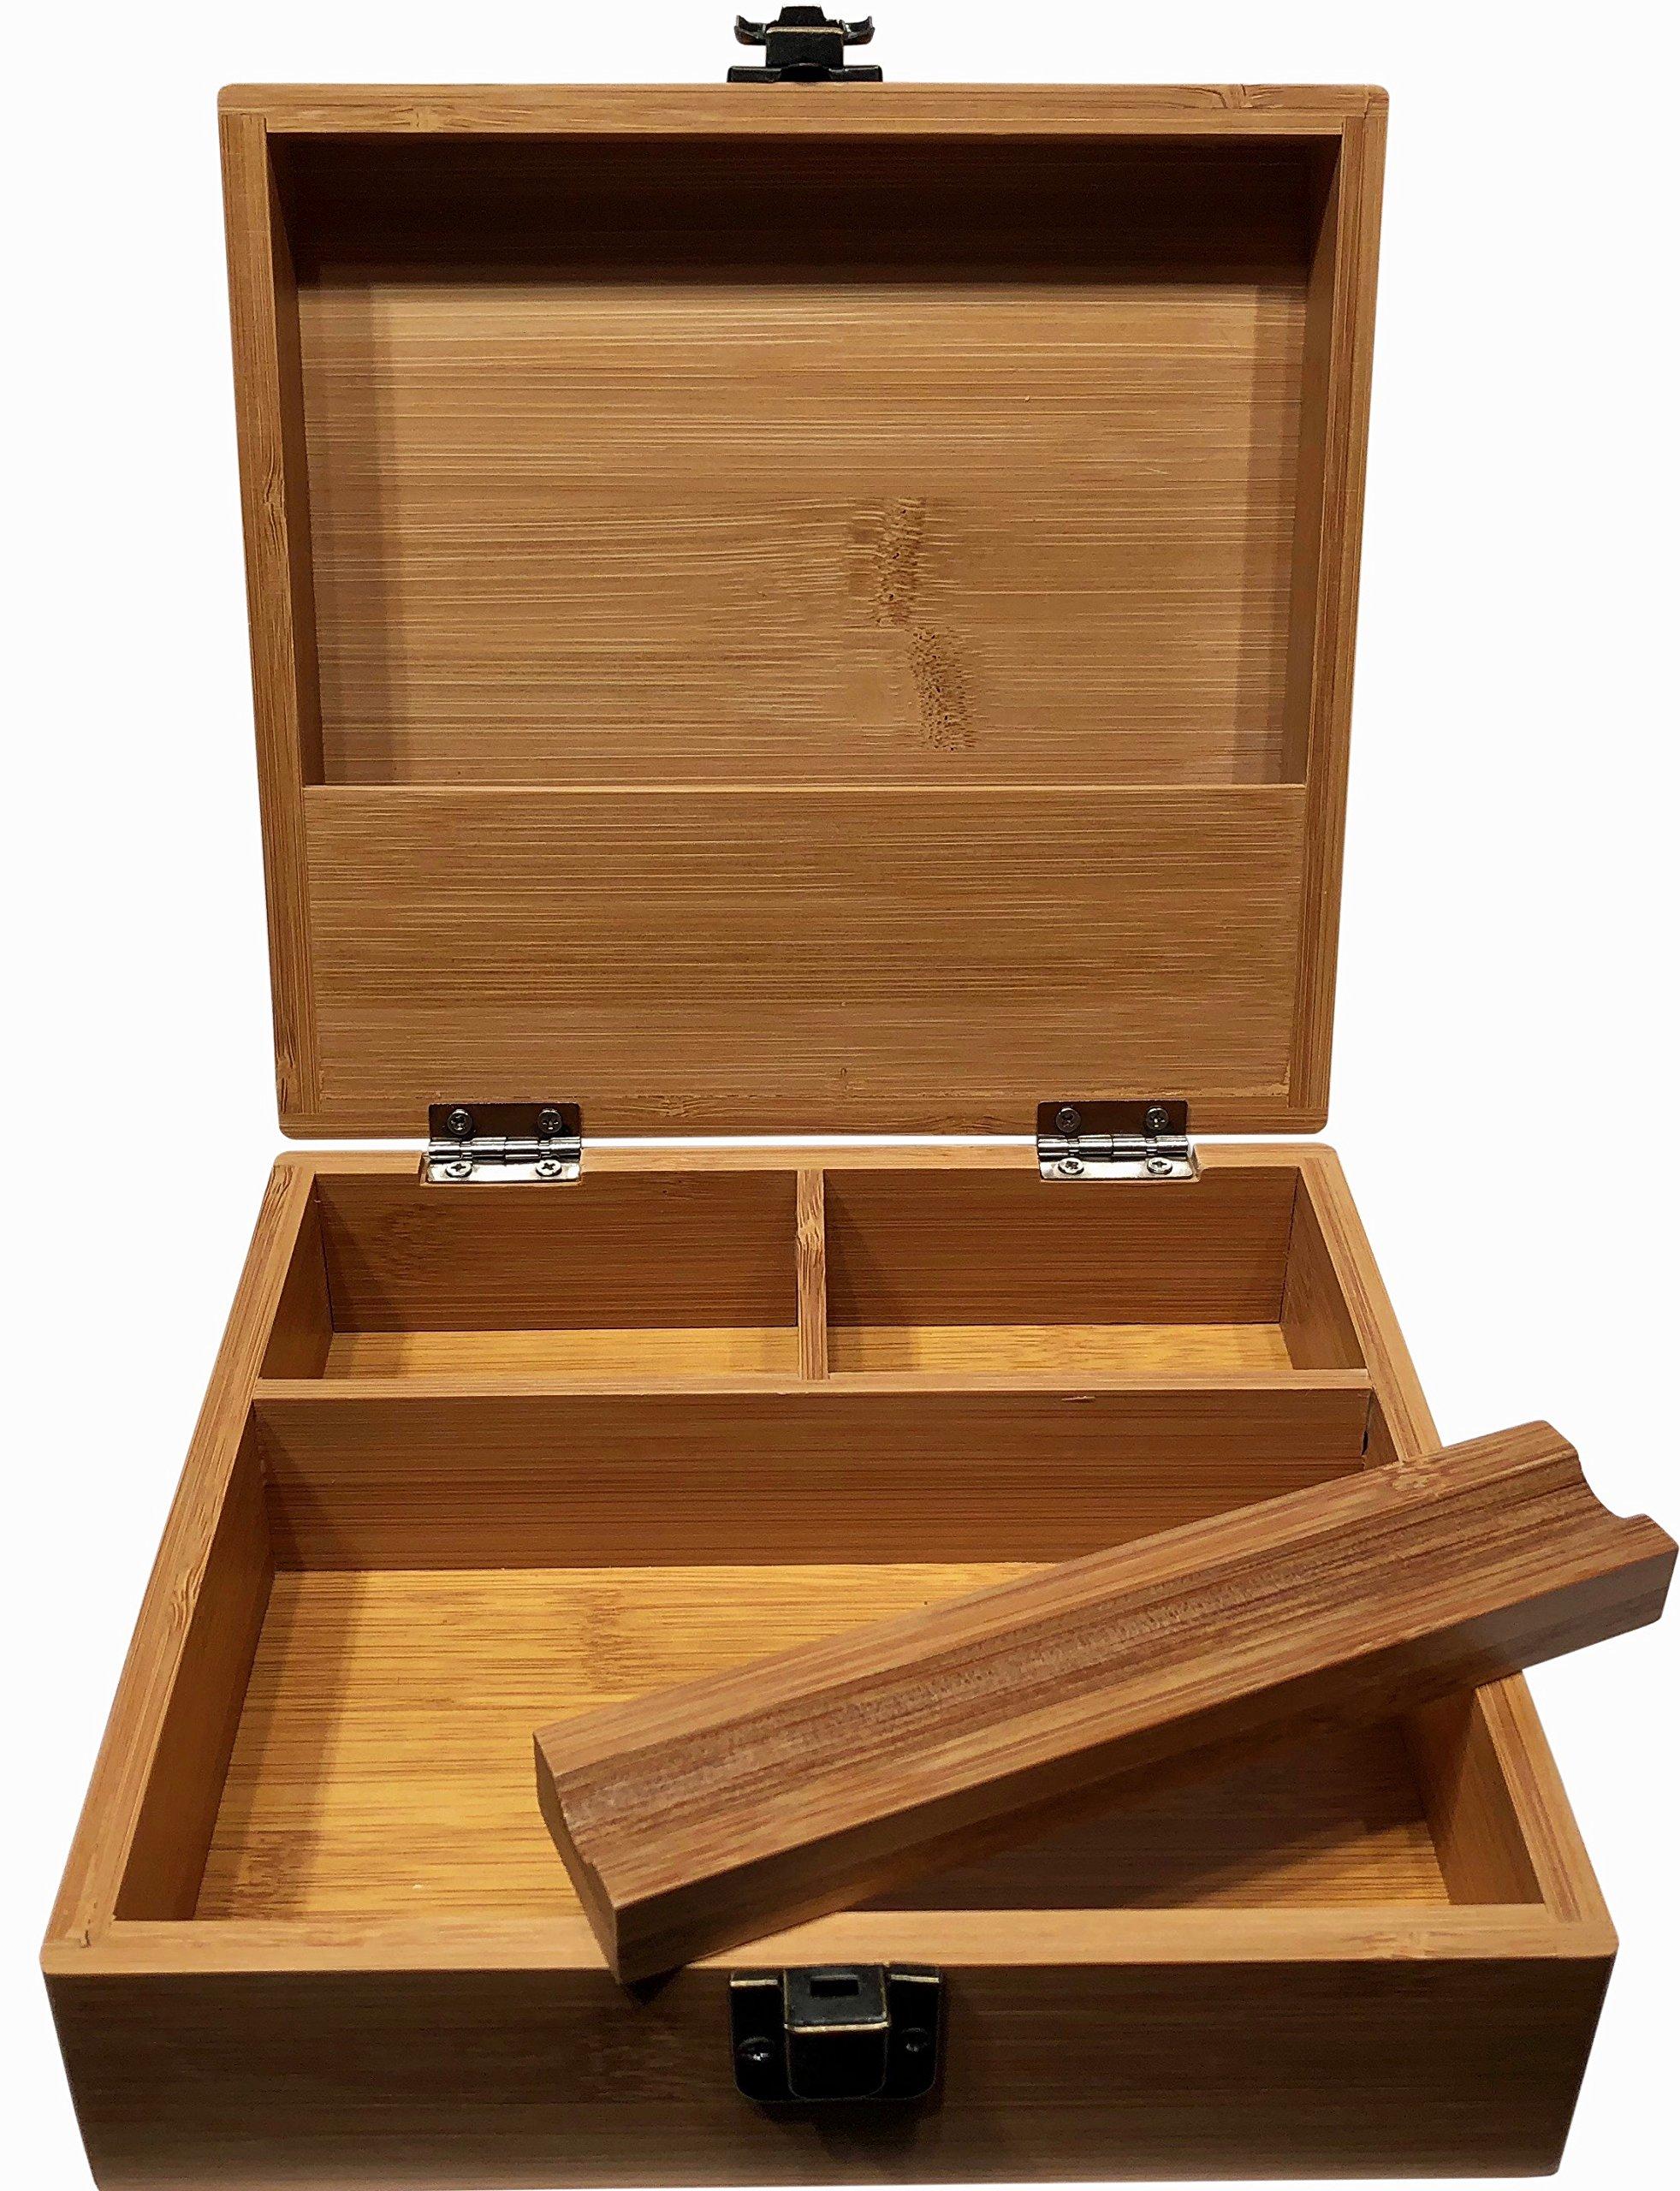 Wood Stash Box with Rolling Tray - Large Decorative Box 7 x 7 Storage Box with Shelf Wooden Latch Box